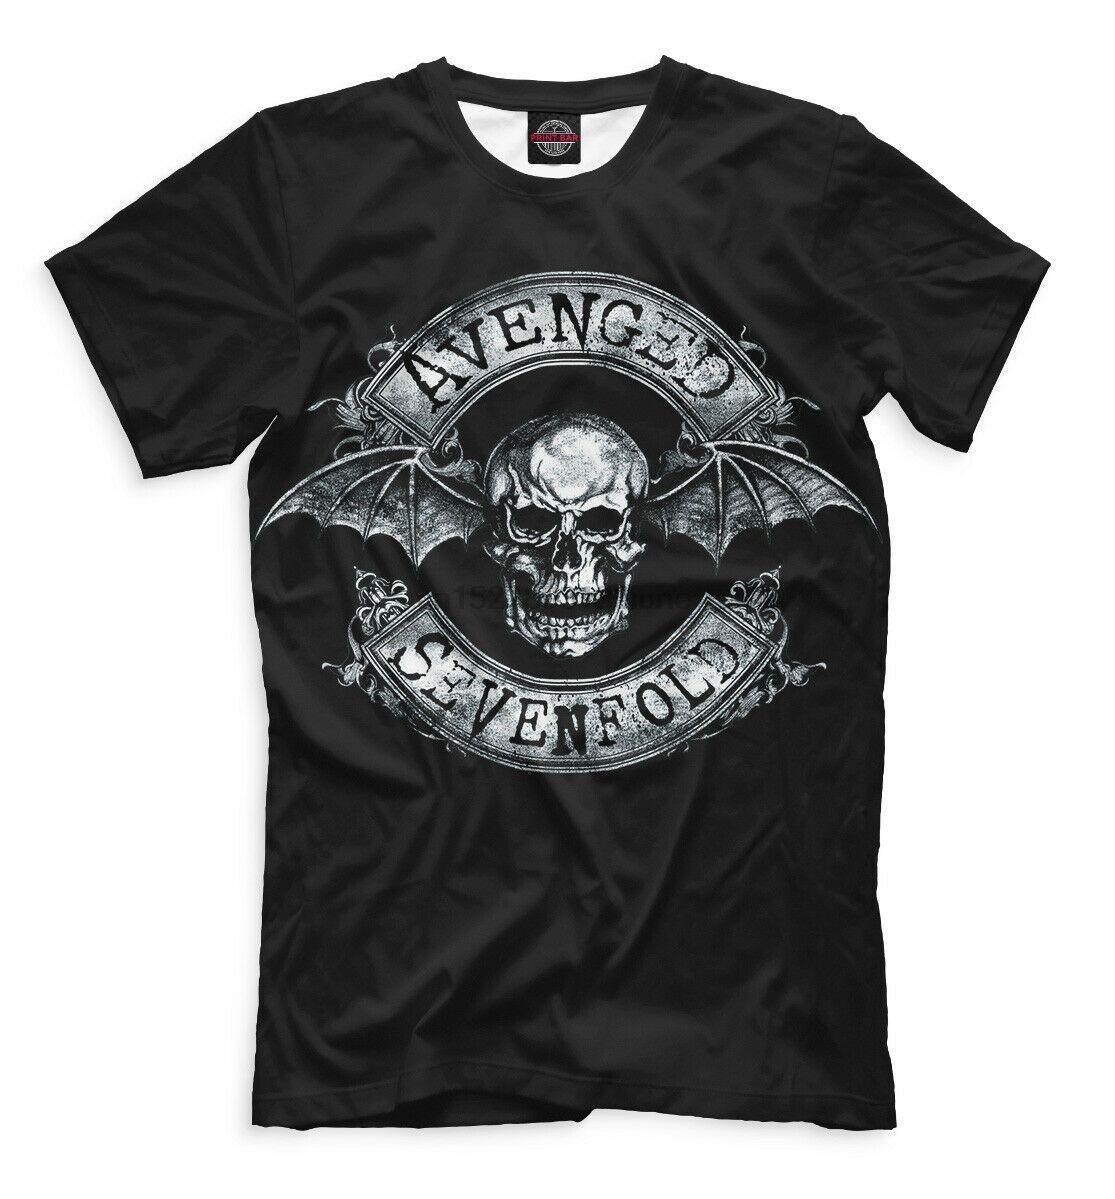 Avenged Sevenfold A7X camiseta - grupo de metales pesados Sombras Vengeance Synyster